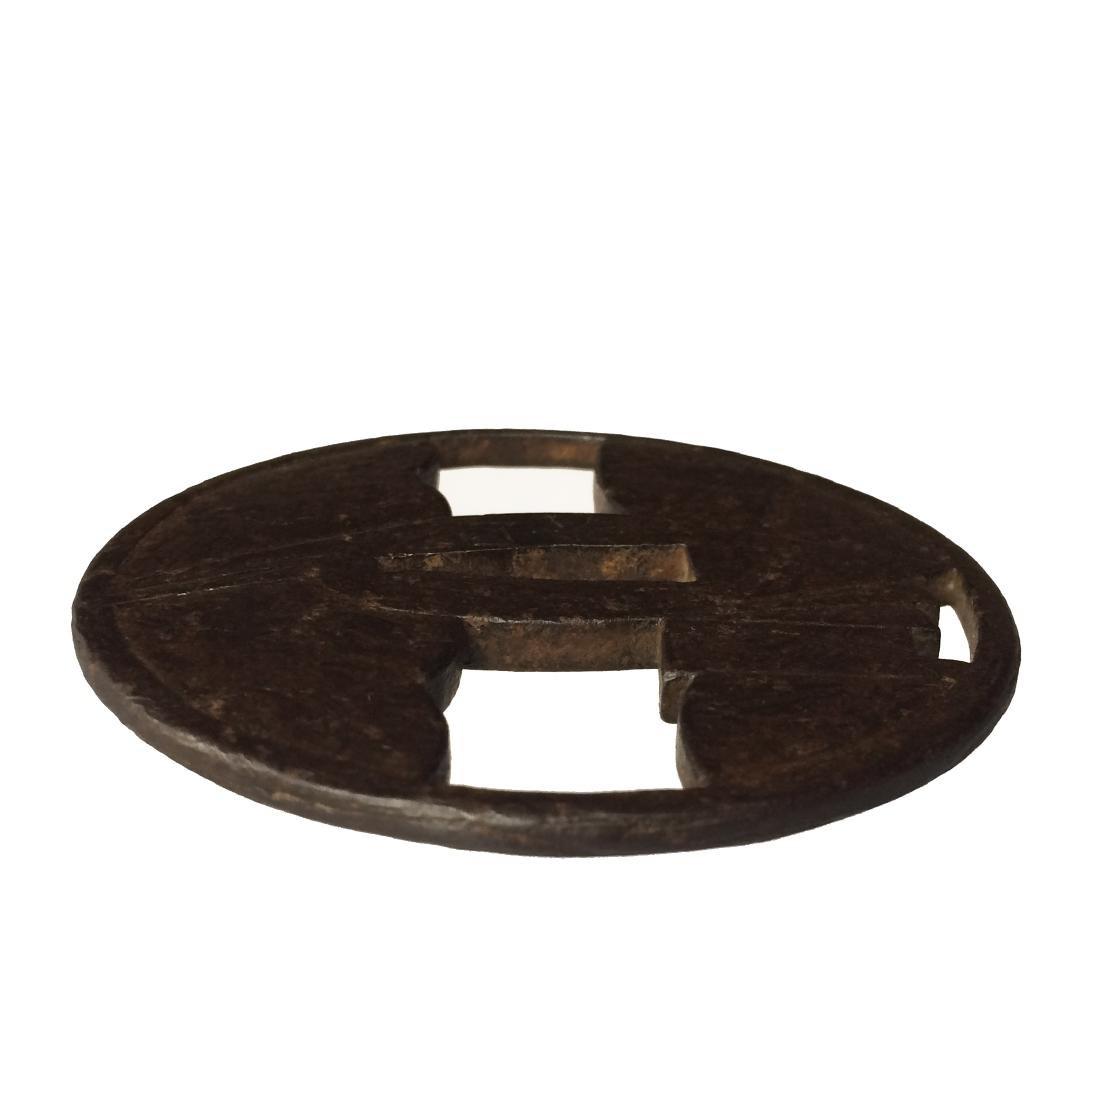 Iron tsuba with wood grain surface (mokume)byKuninaga - 2